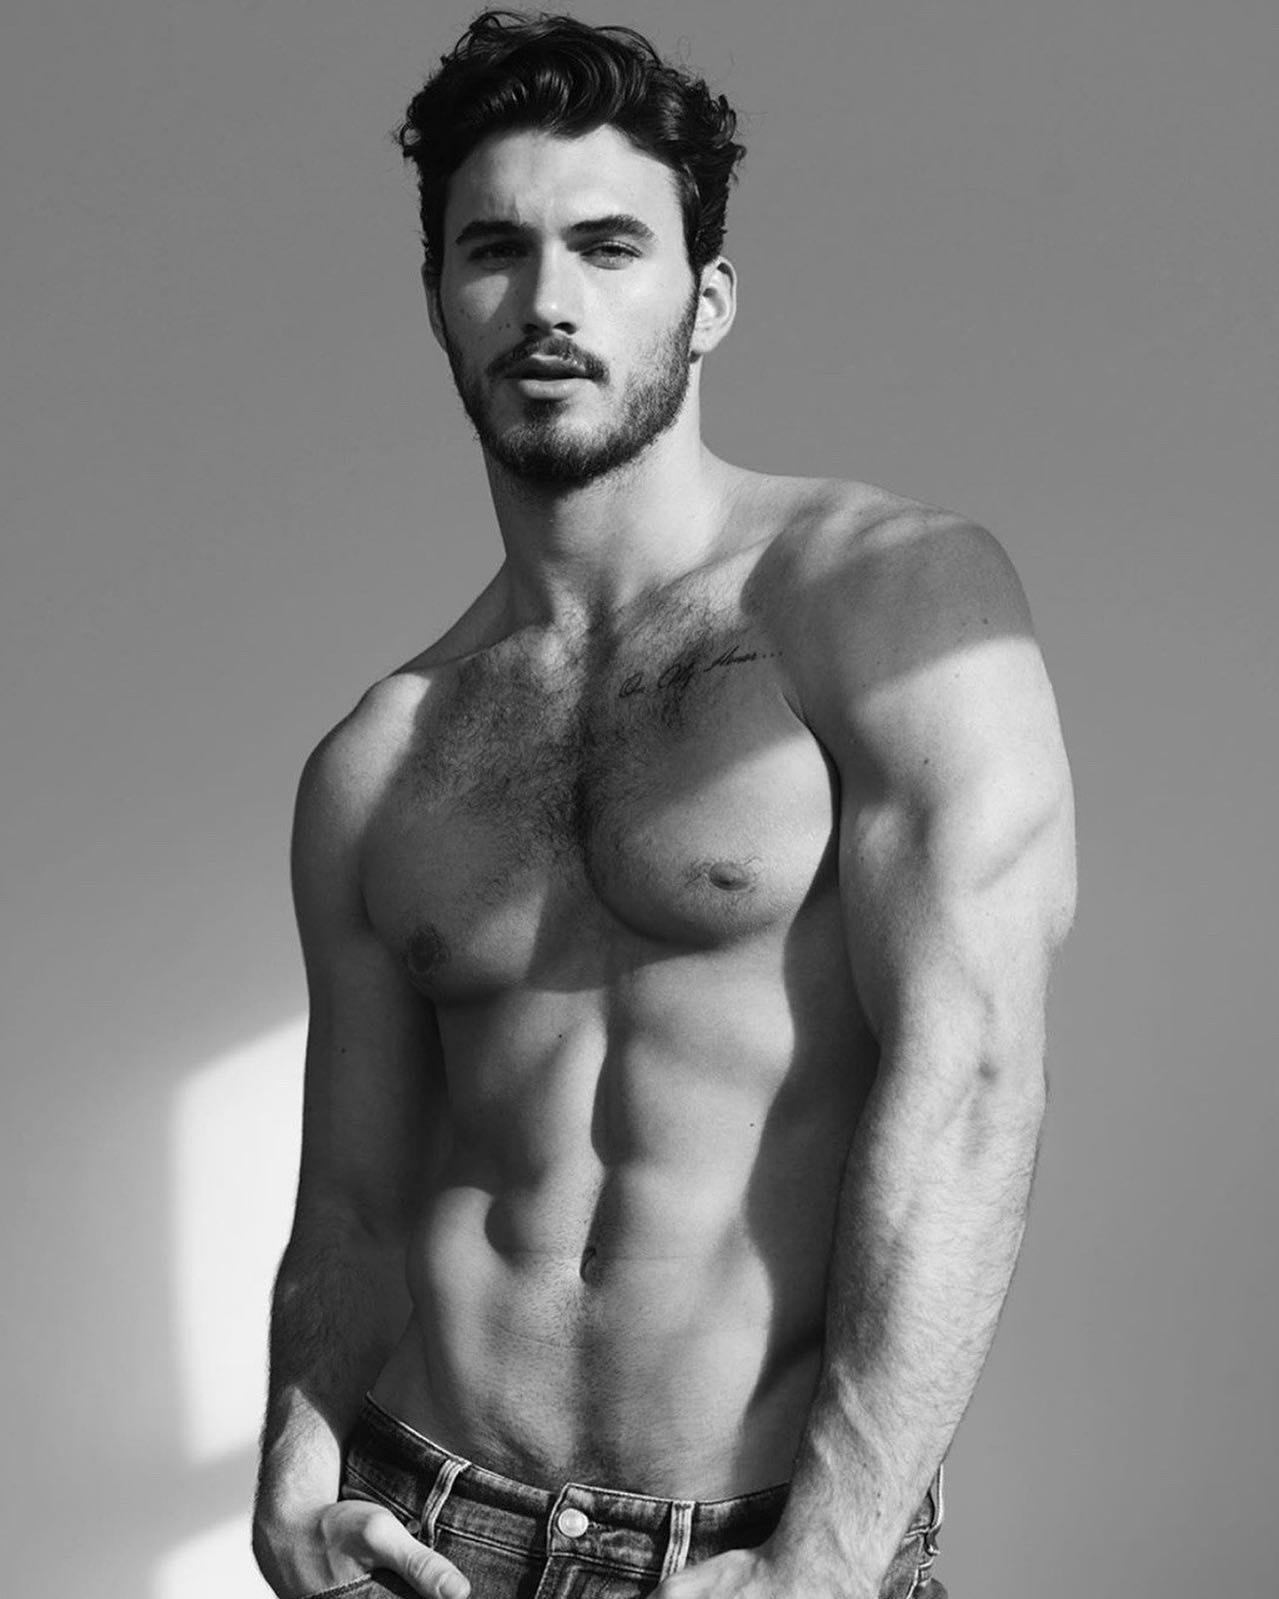 #men #abs #blackandwhite #muscle